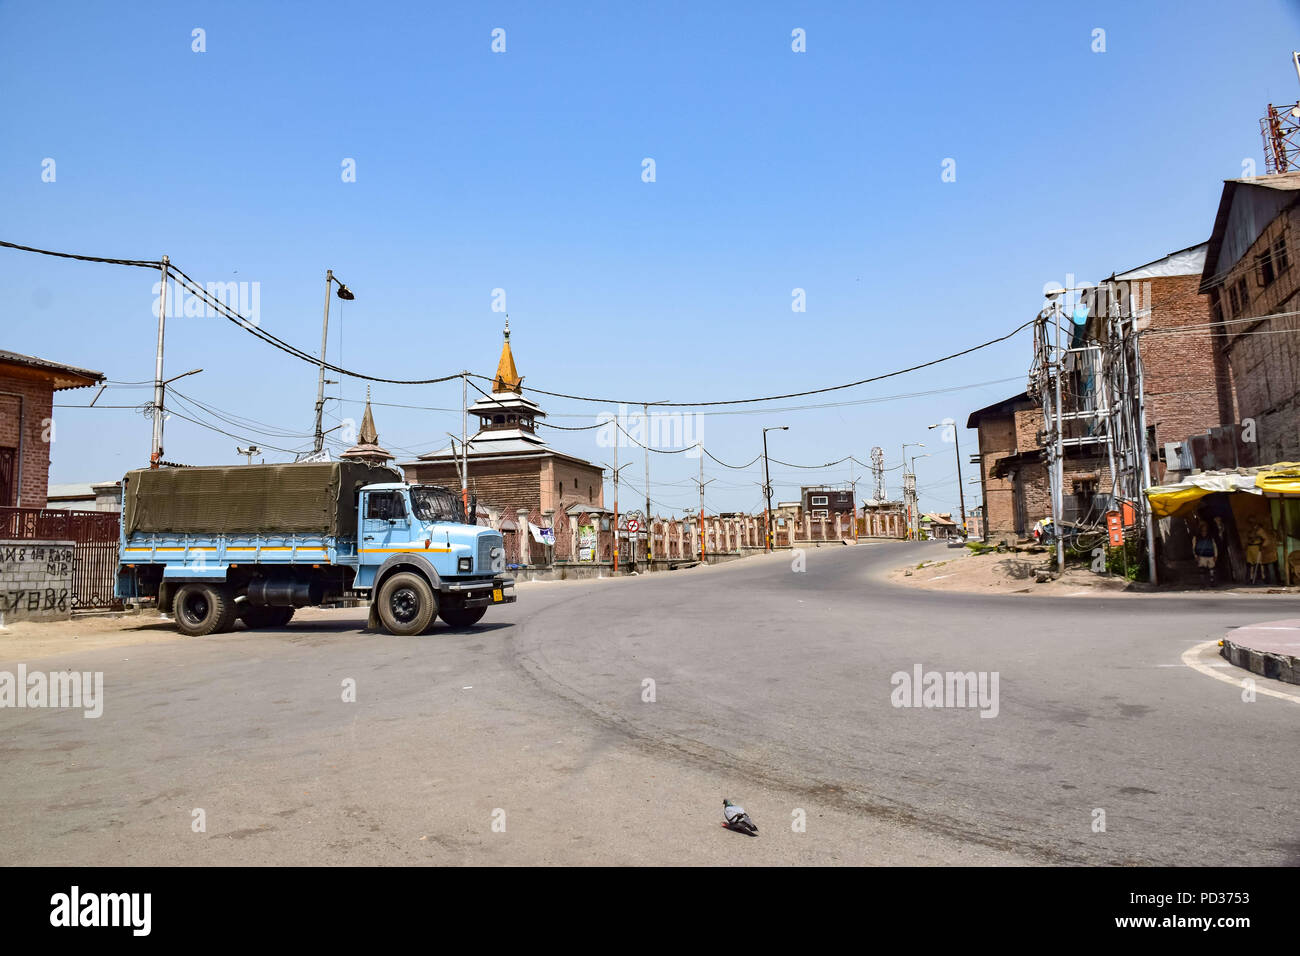 Srinagar, Jammu & Kashmir, - August 6, 2018 - Curfew and shutdown